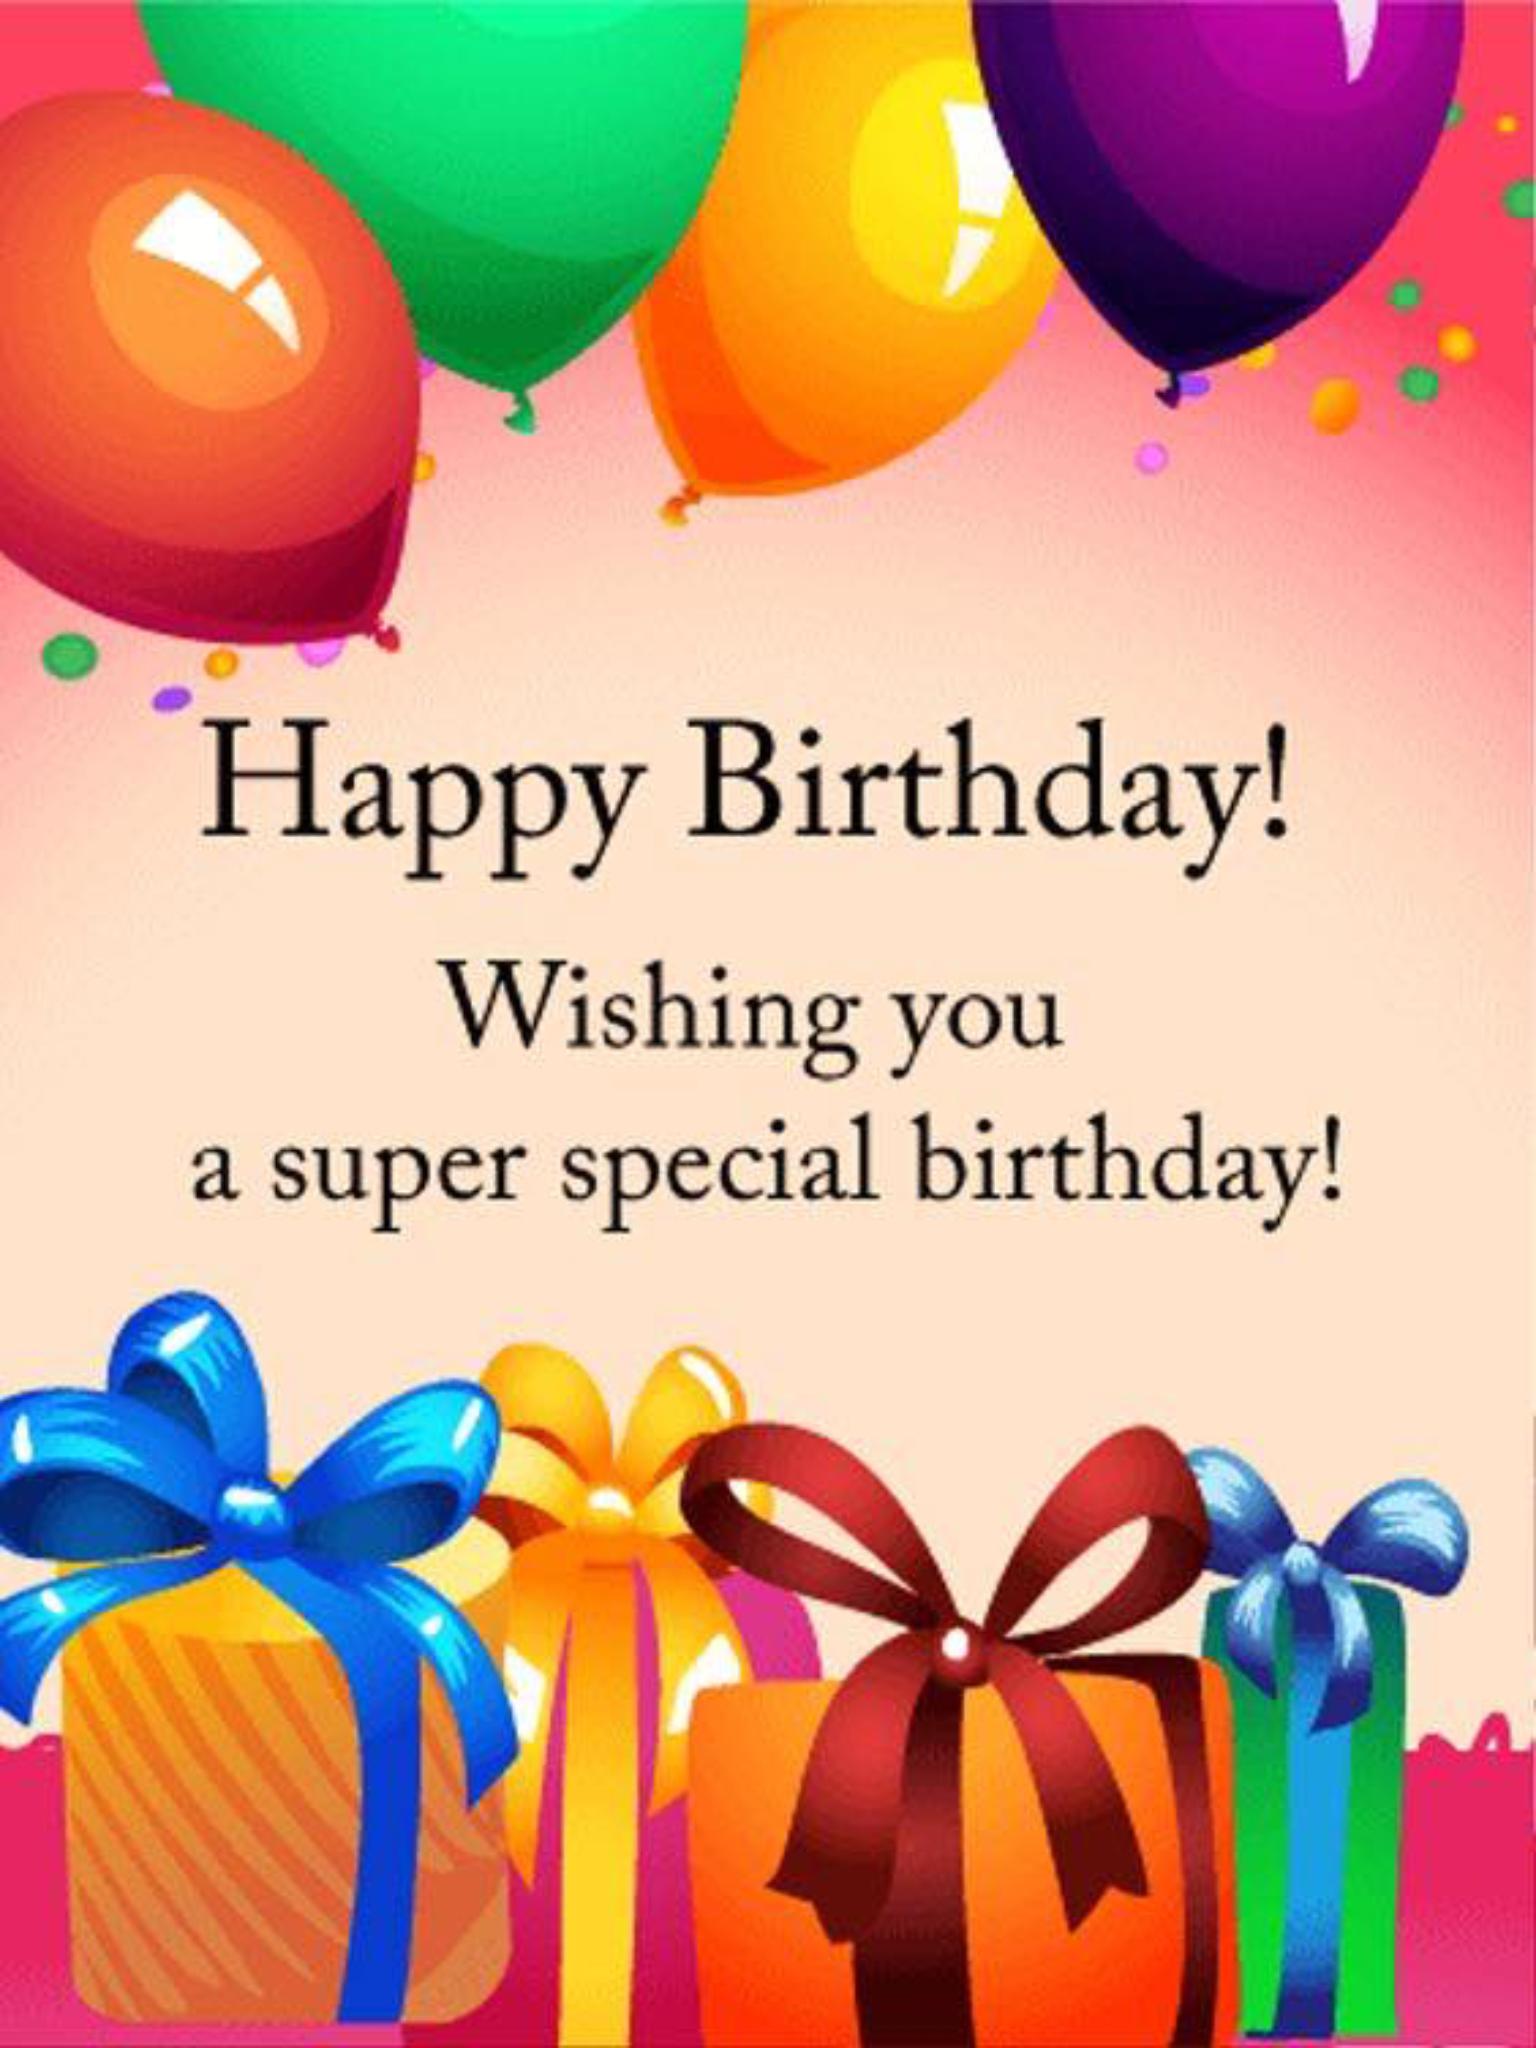 Pin By Kimberly B On Happy Birthday Pinterest Birthdays Happy